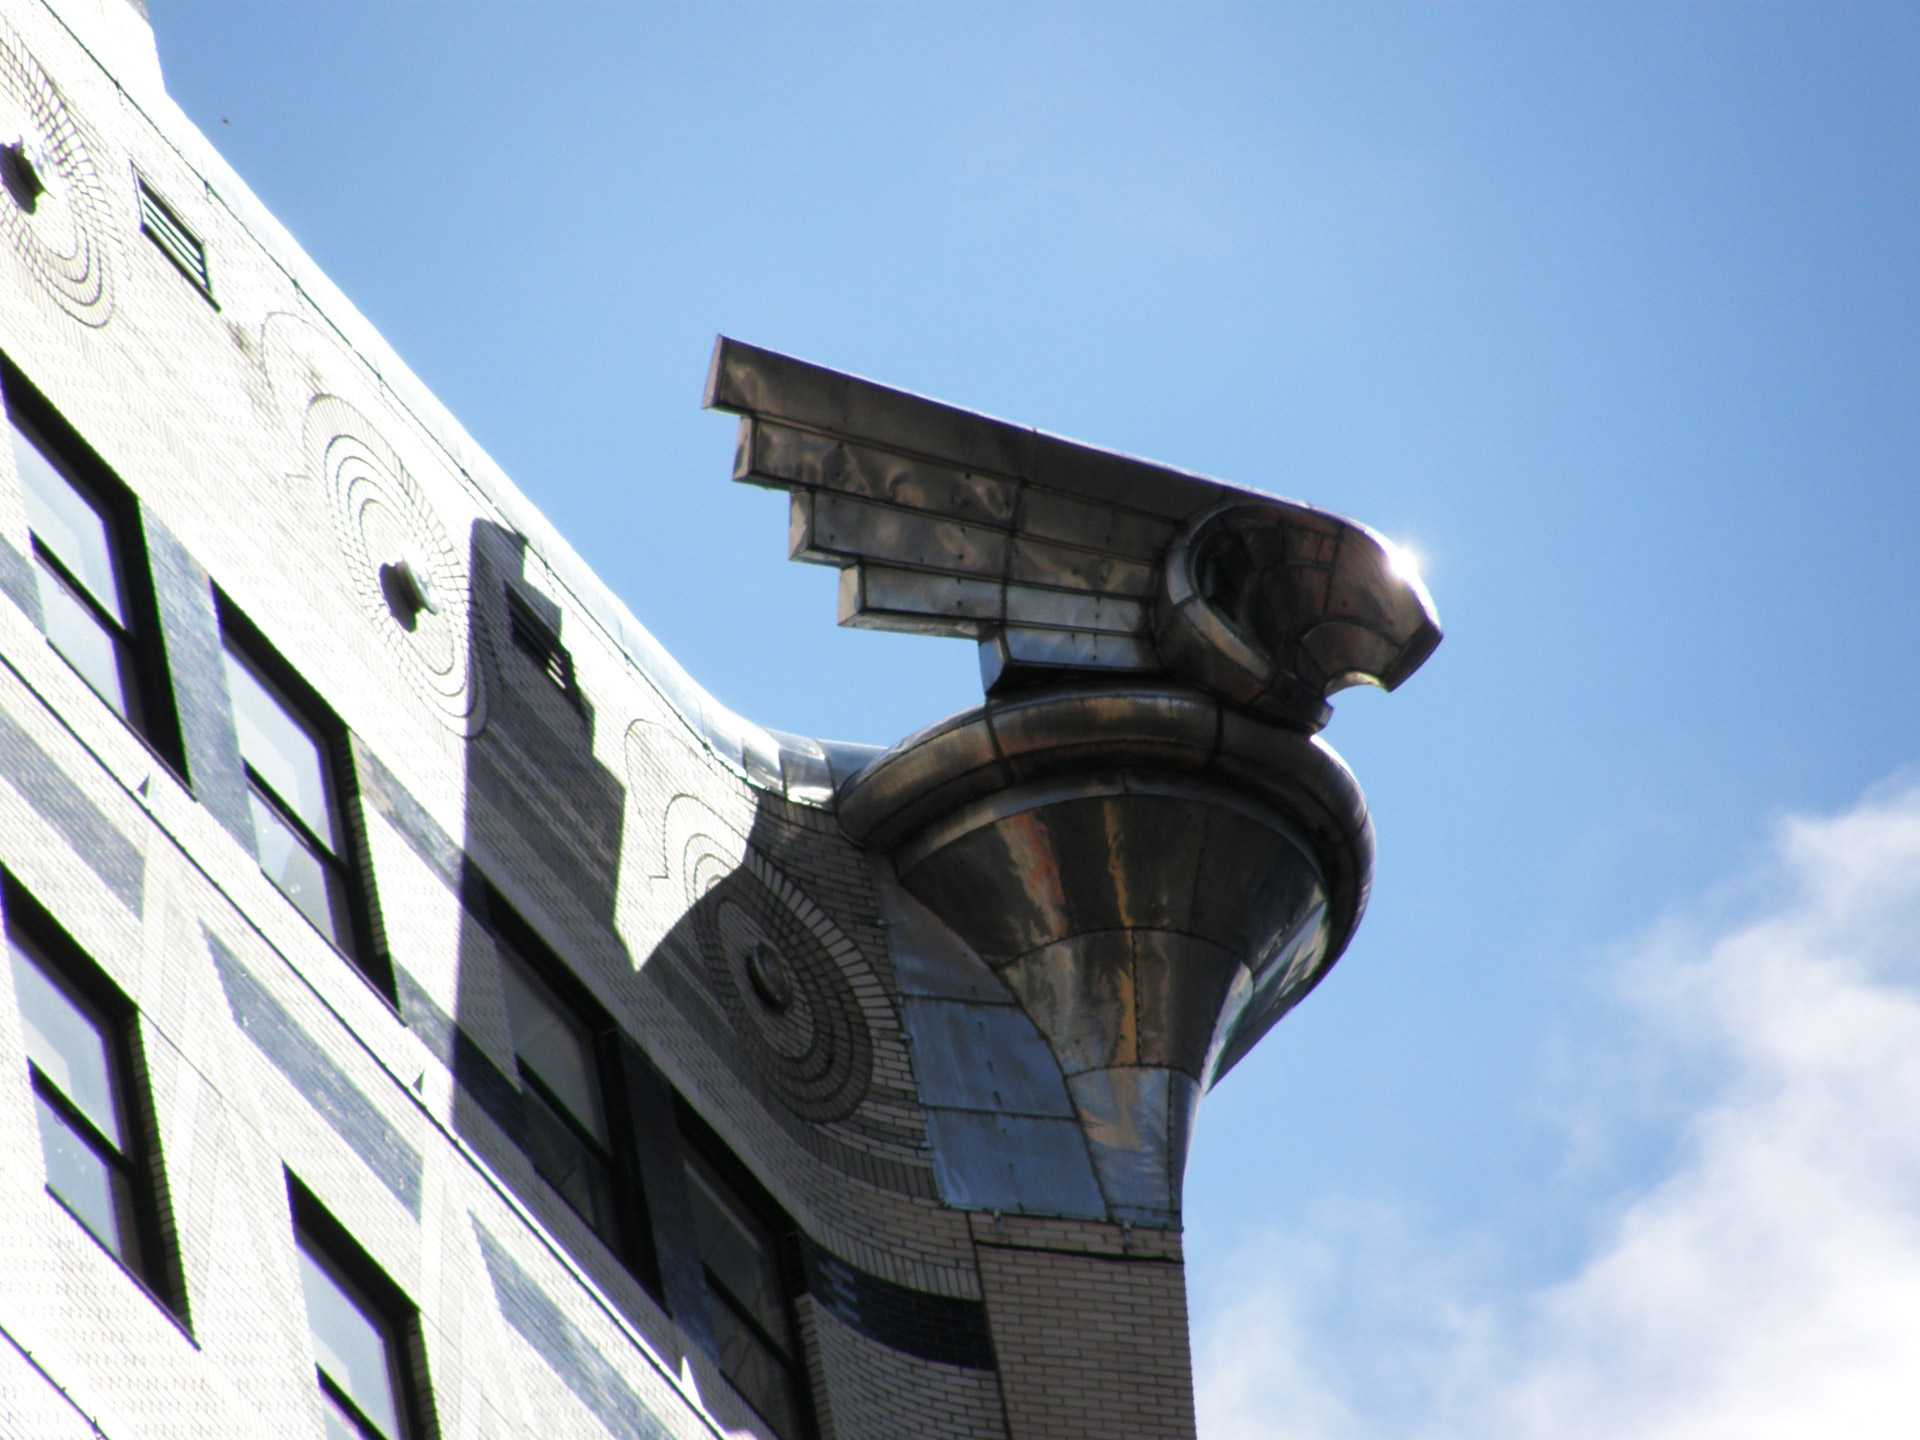 Eagle gargoyle on top of a building